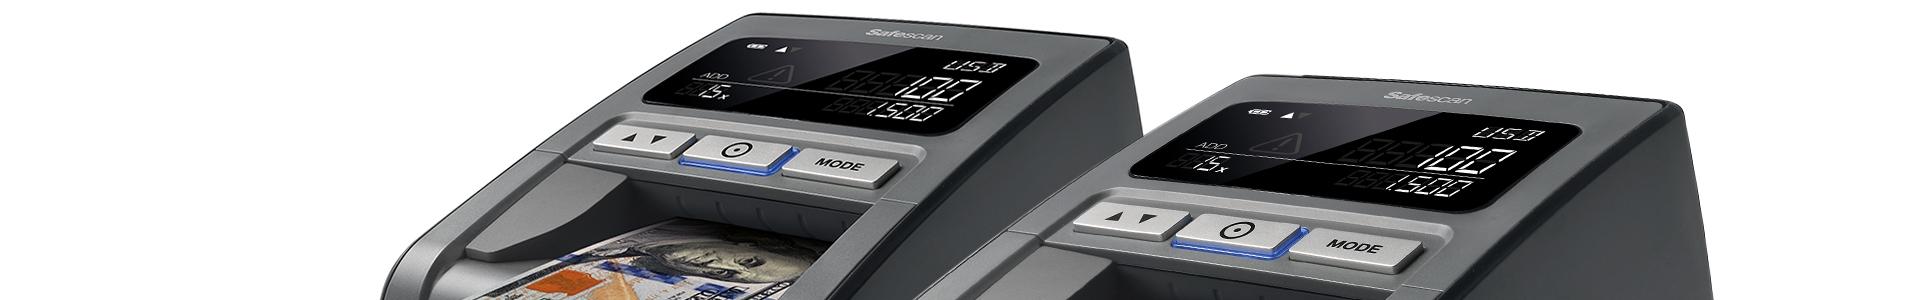 Counterfeit Detectors 1